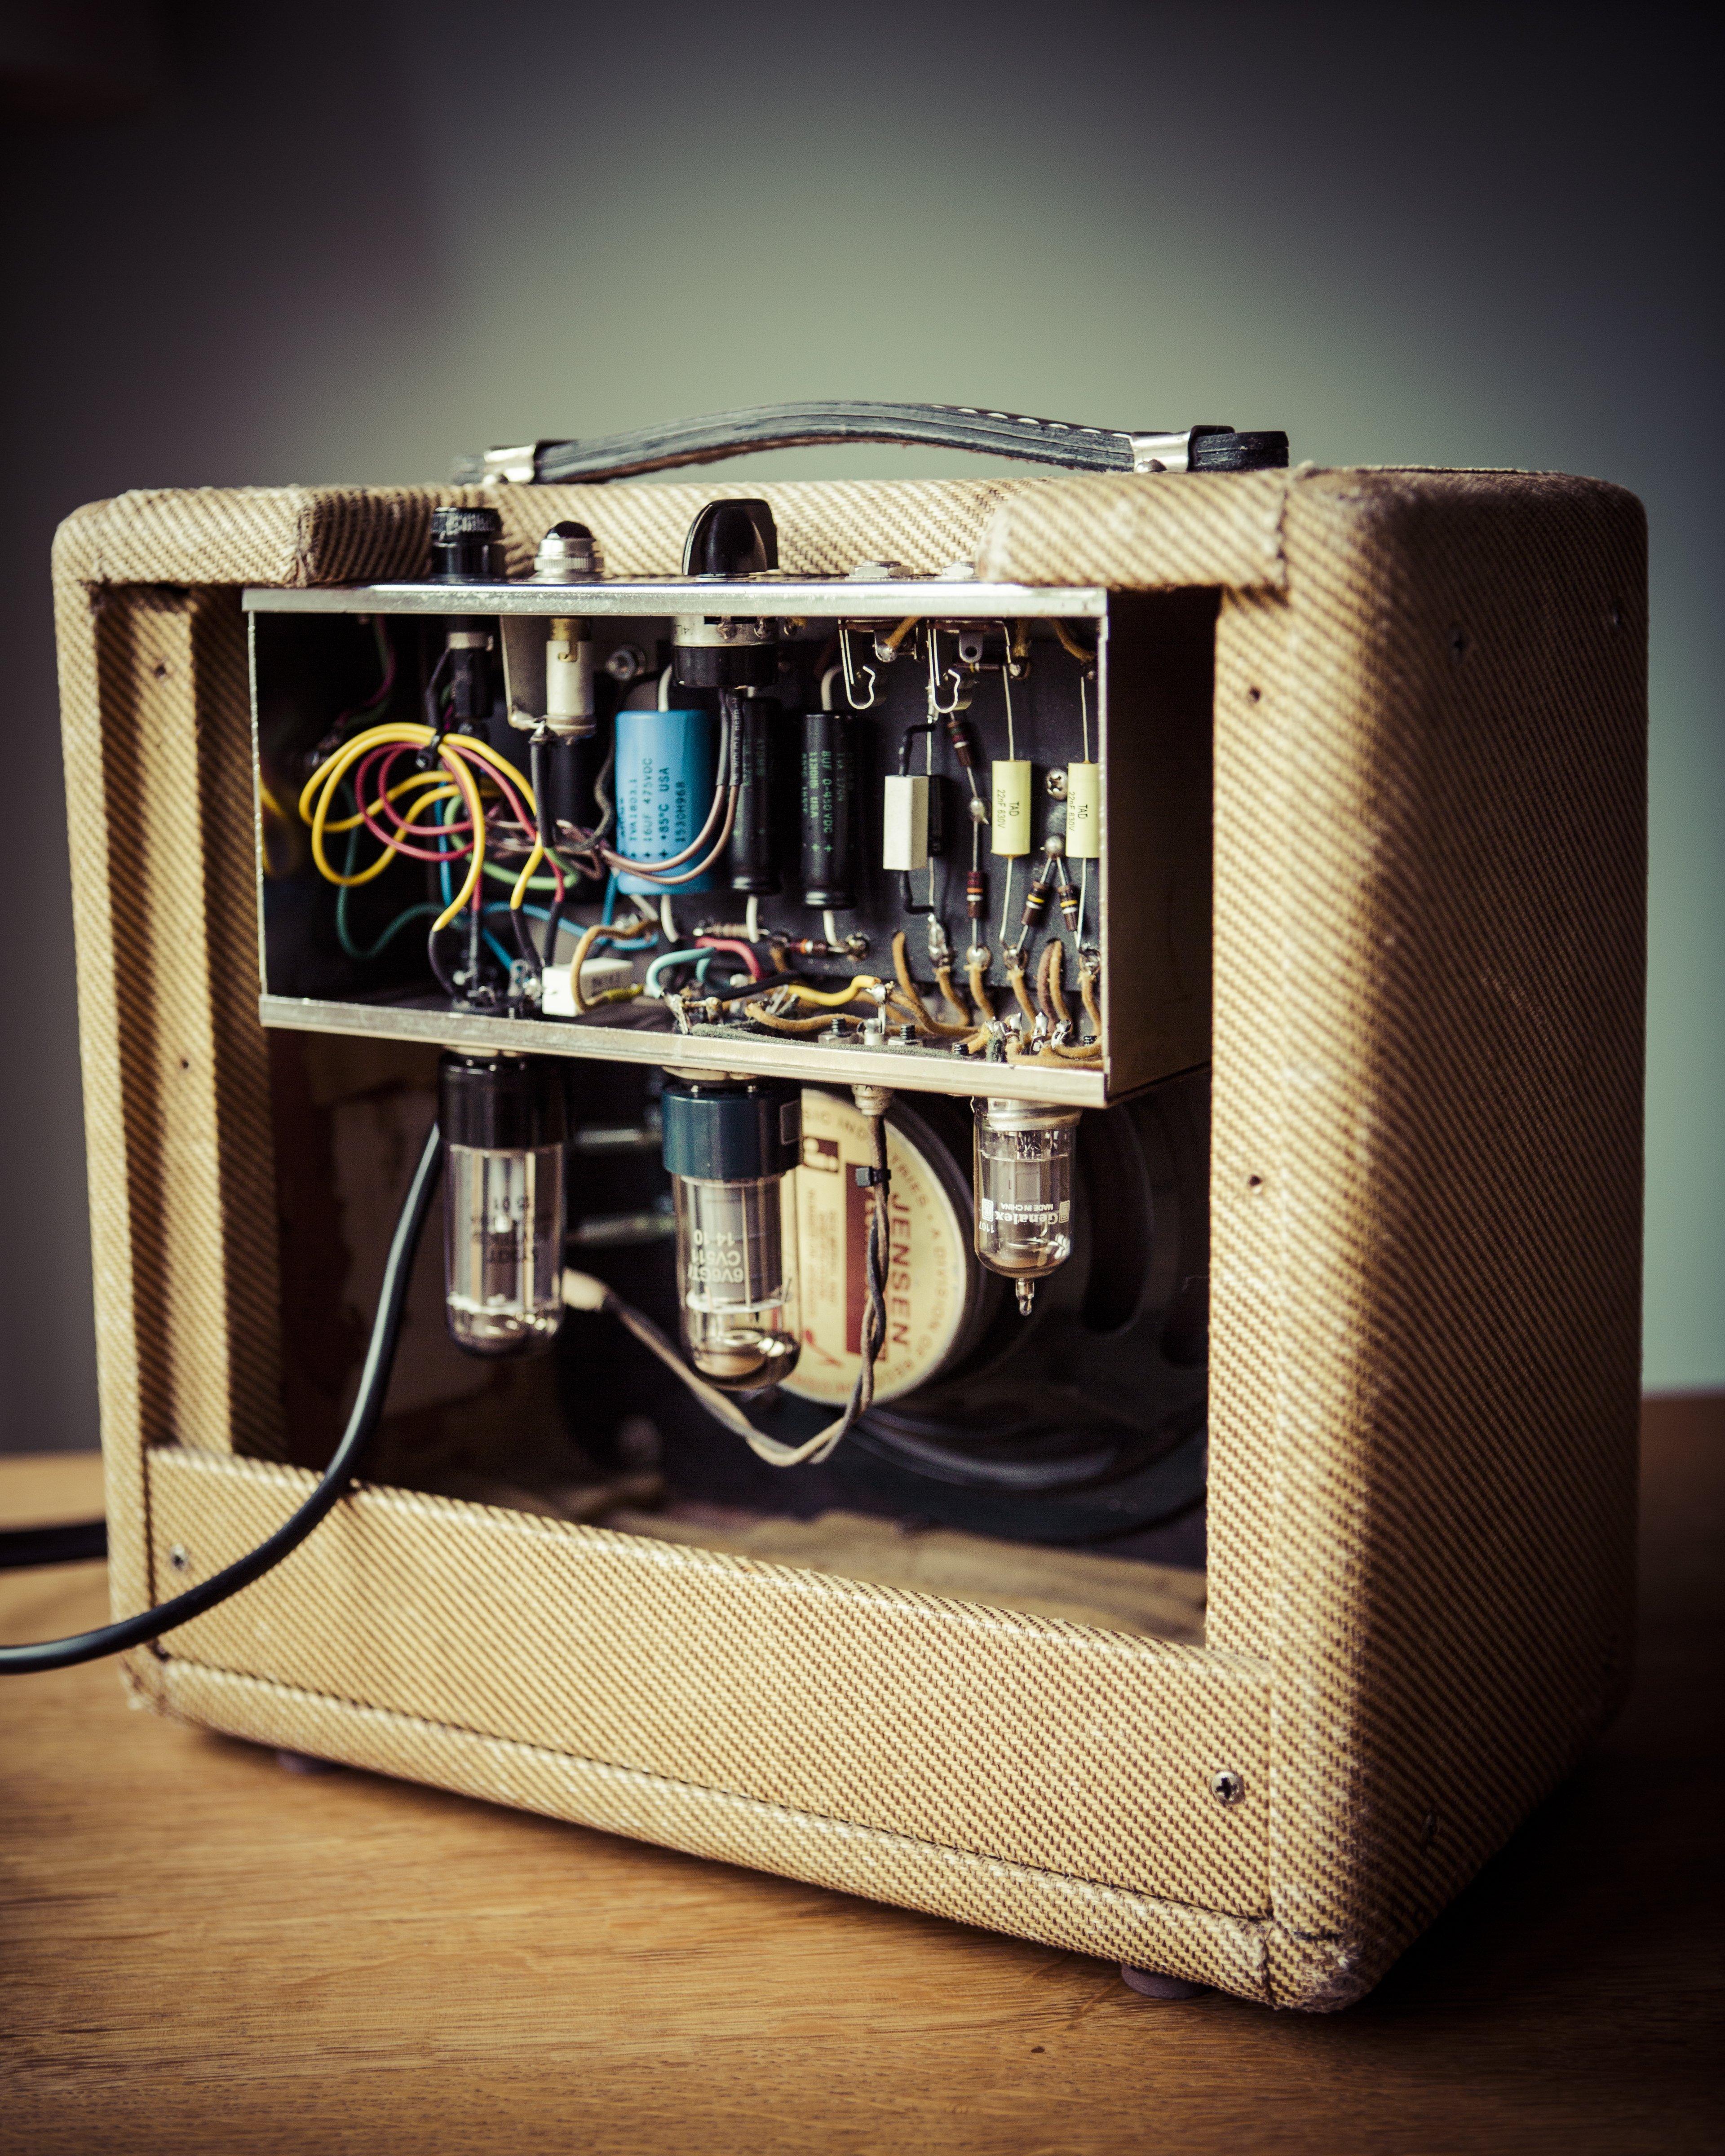 Fender Silver Face Amplifier